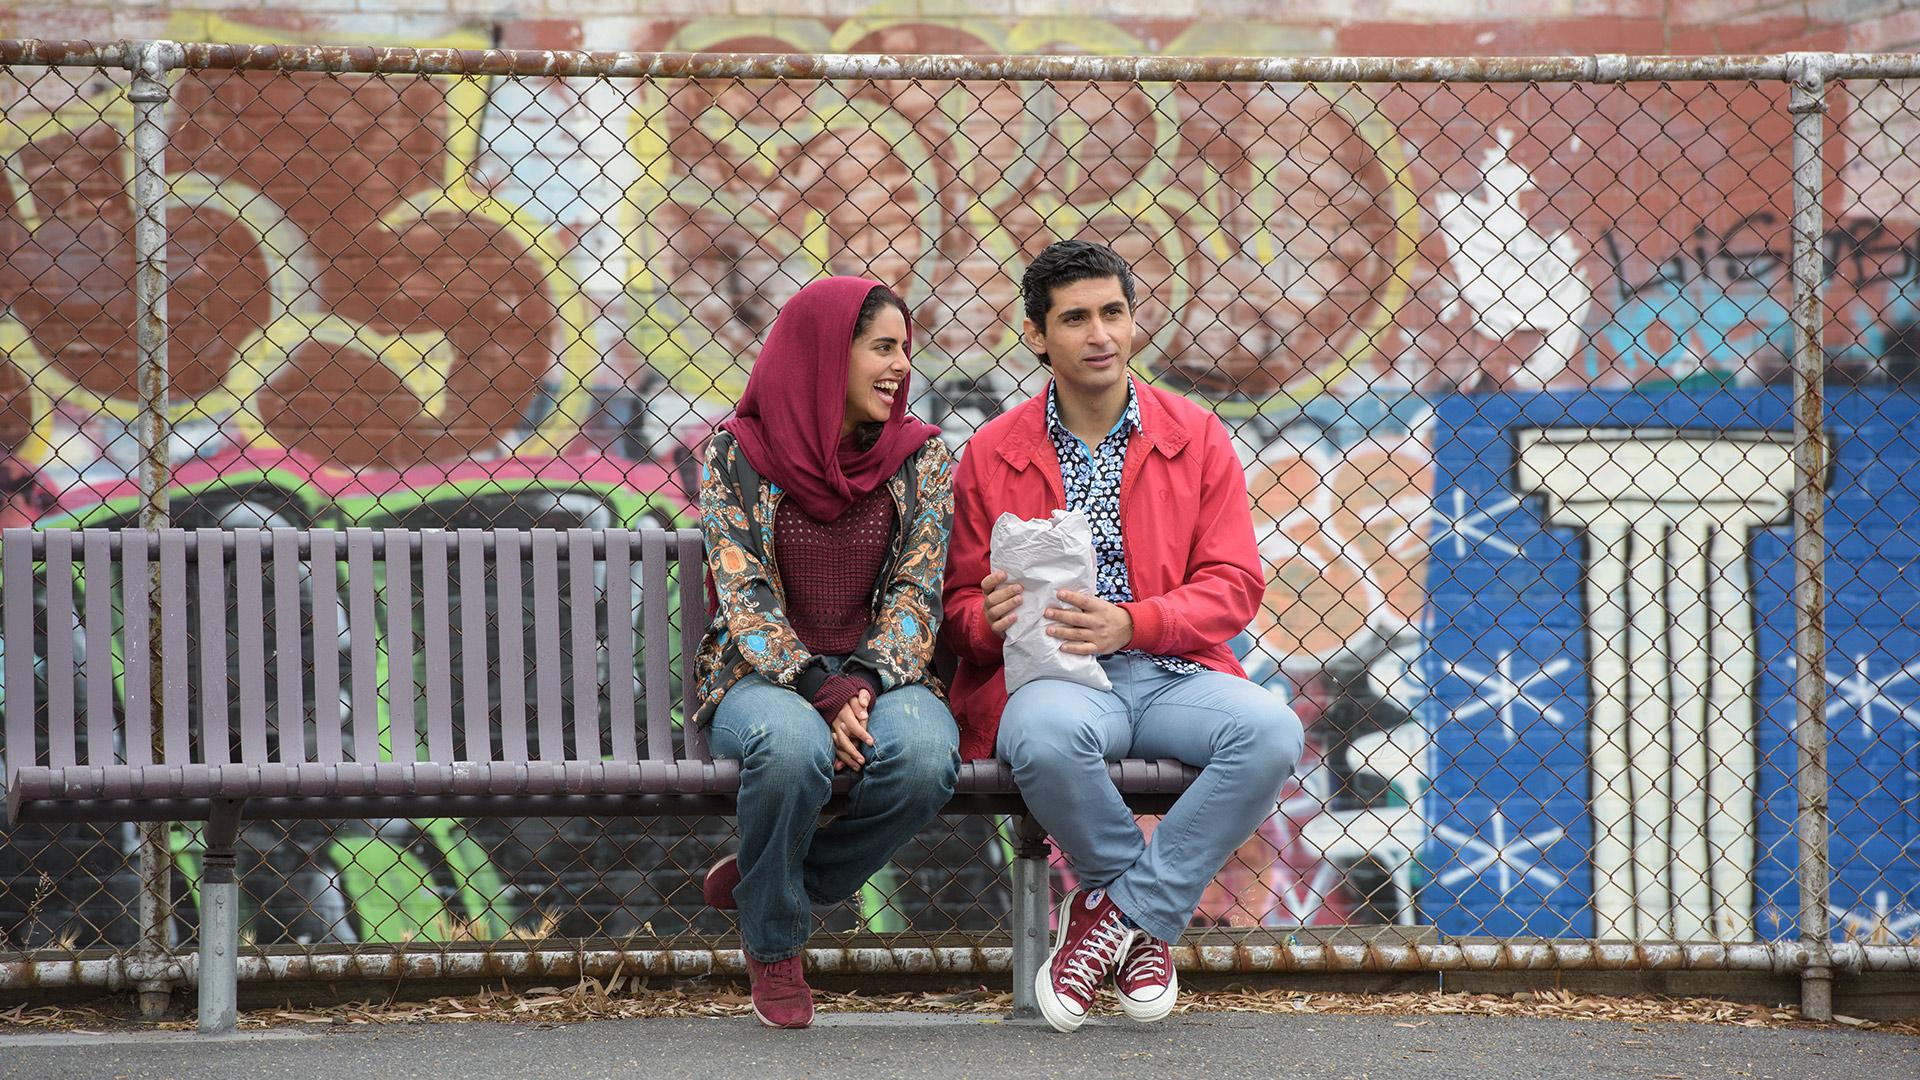 ali's wedding - arab film festival australiaarab film festival australia